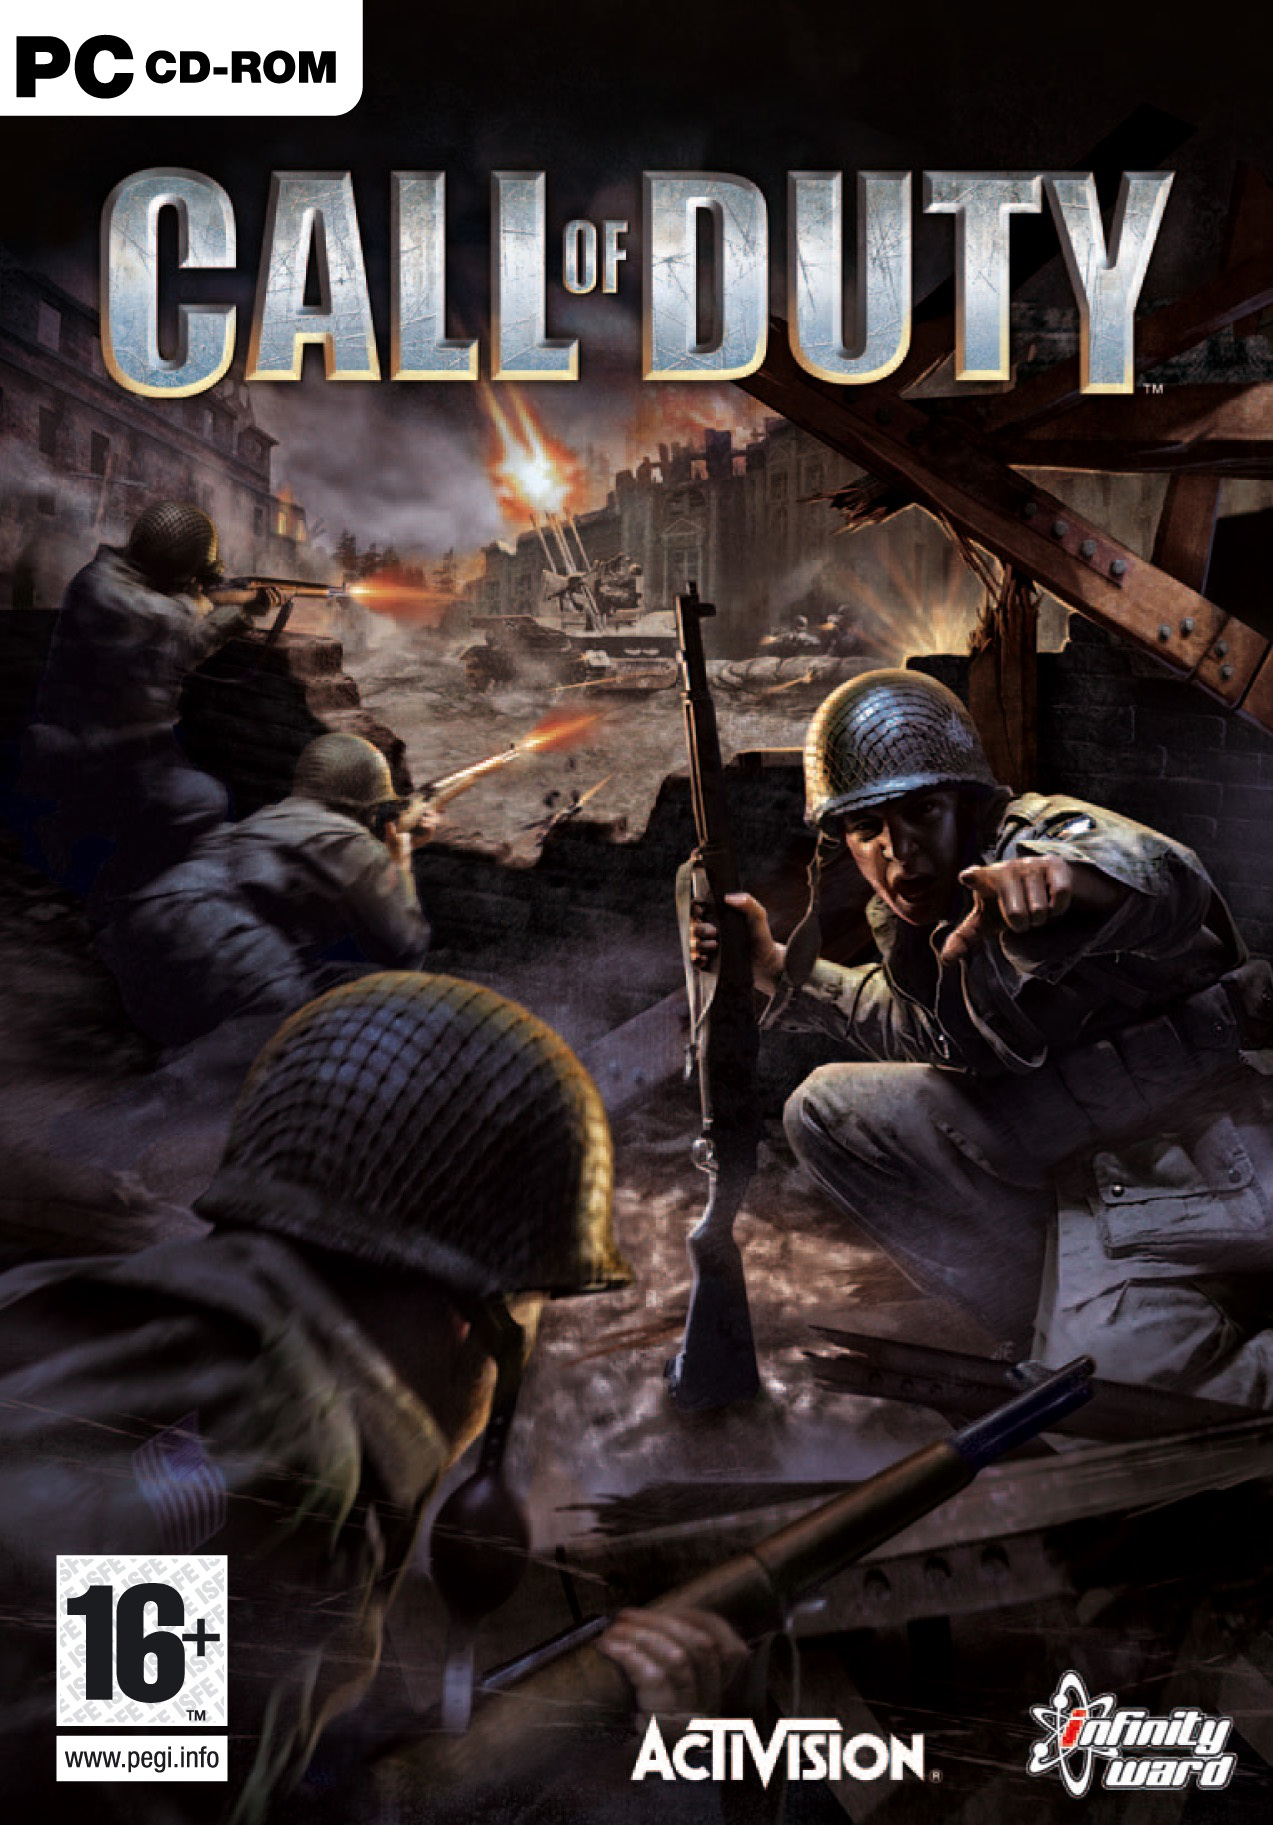 Call of duty 1 windows 10